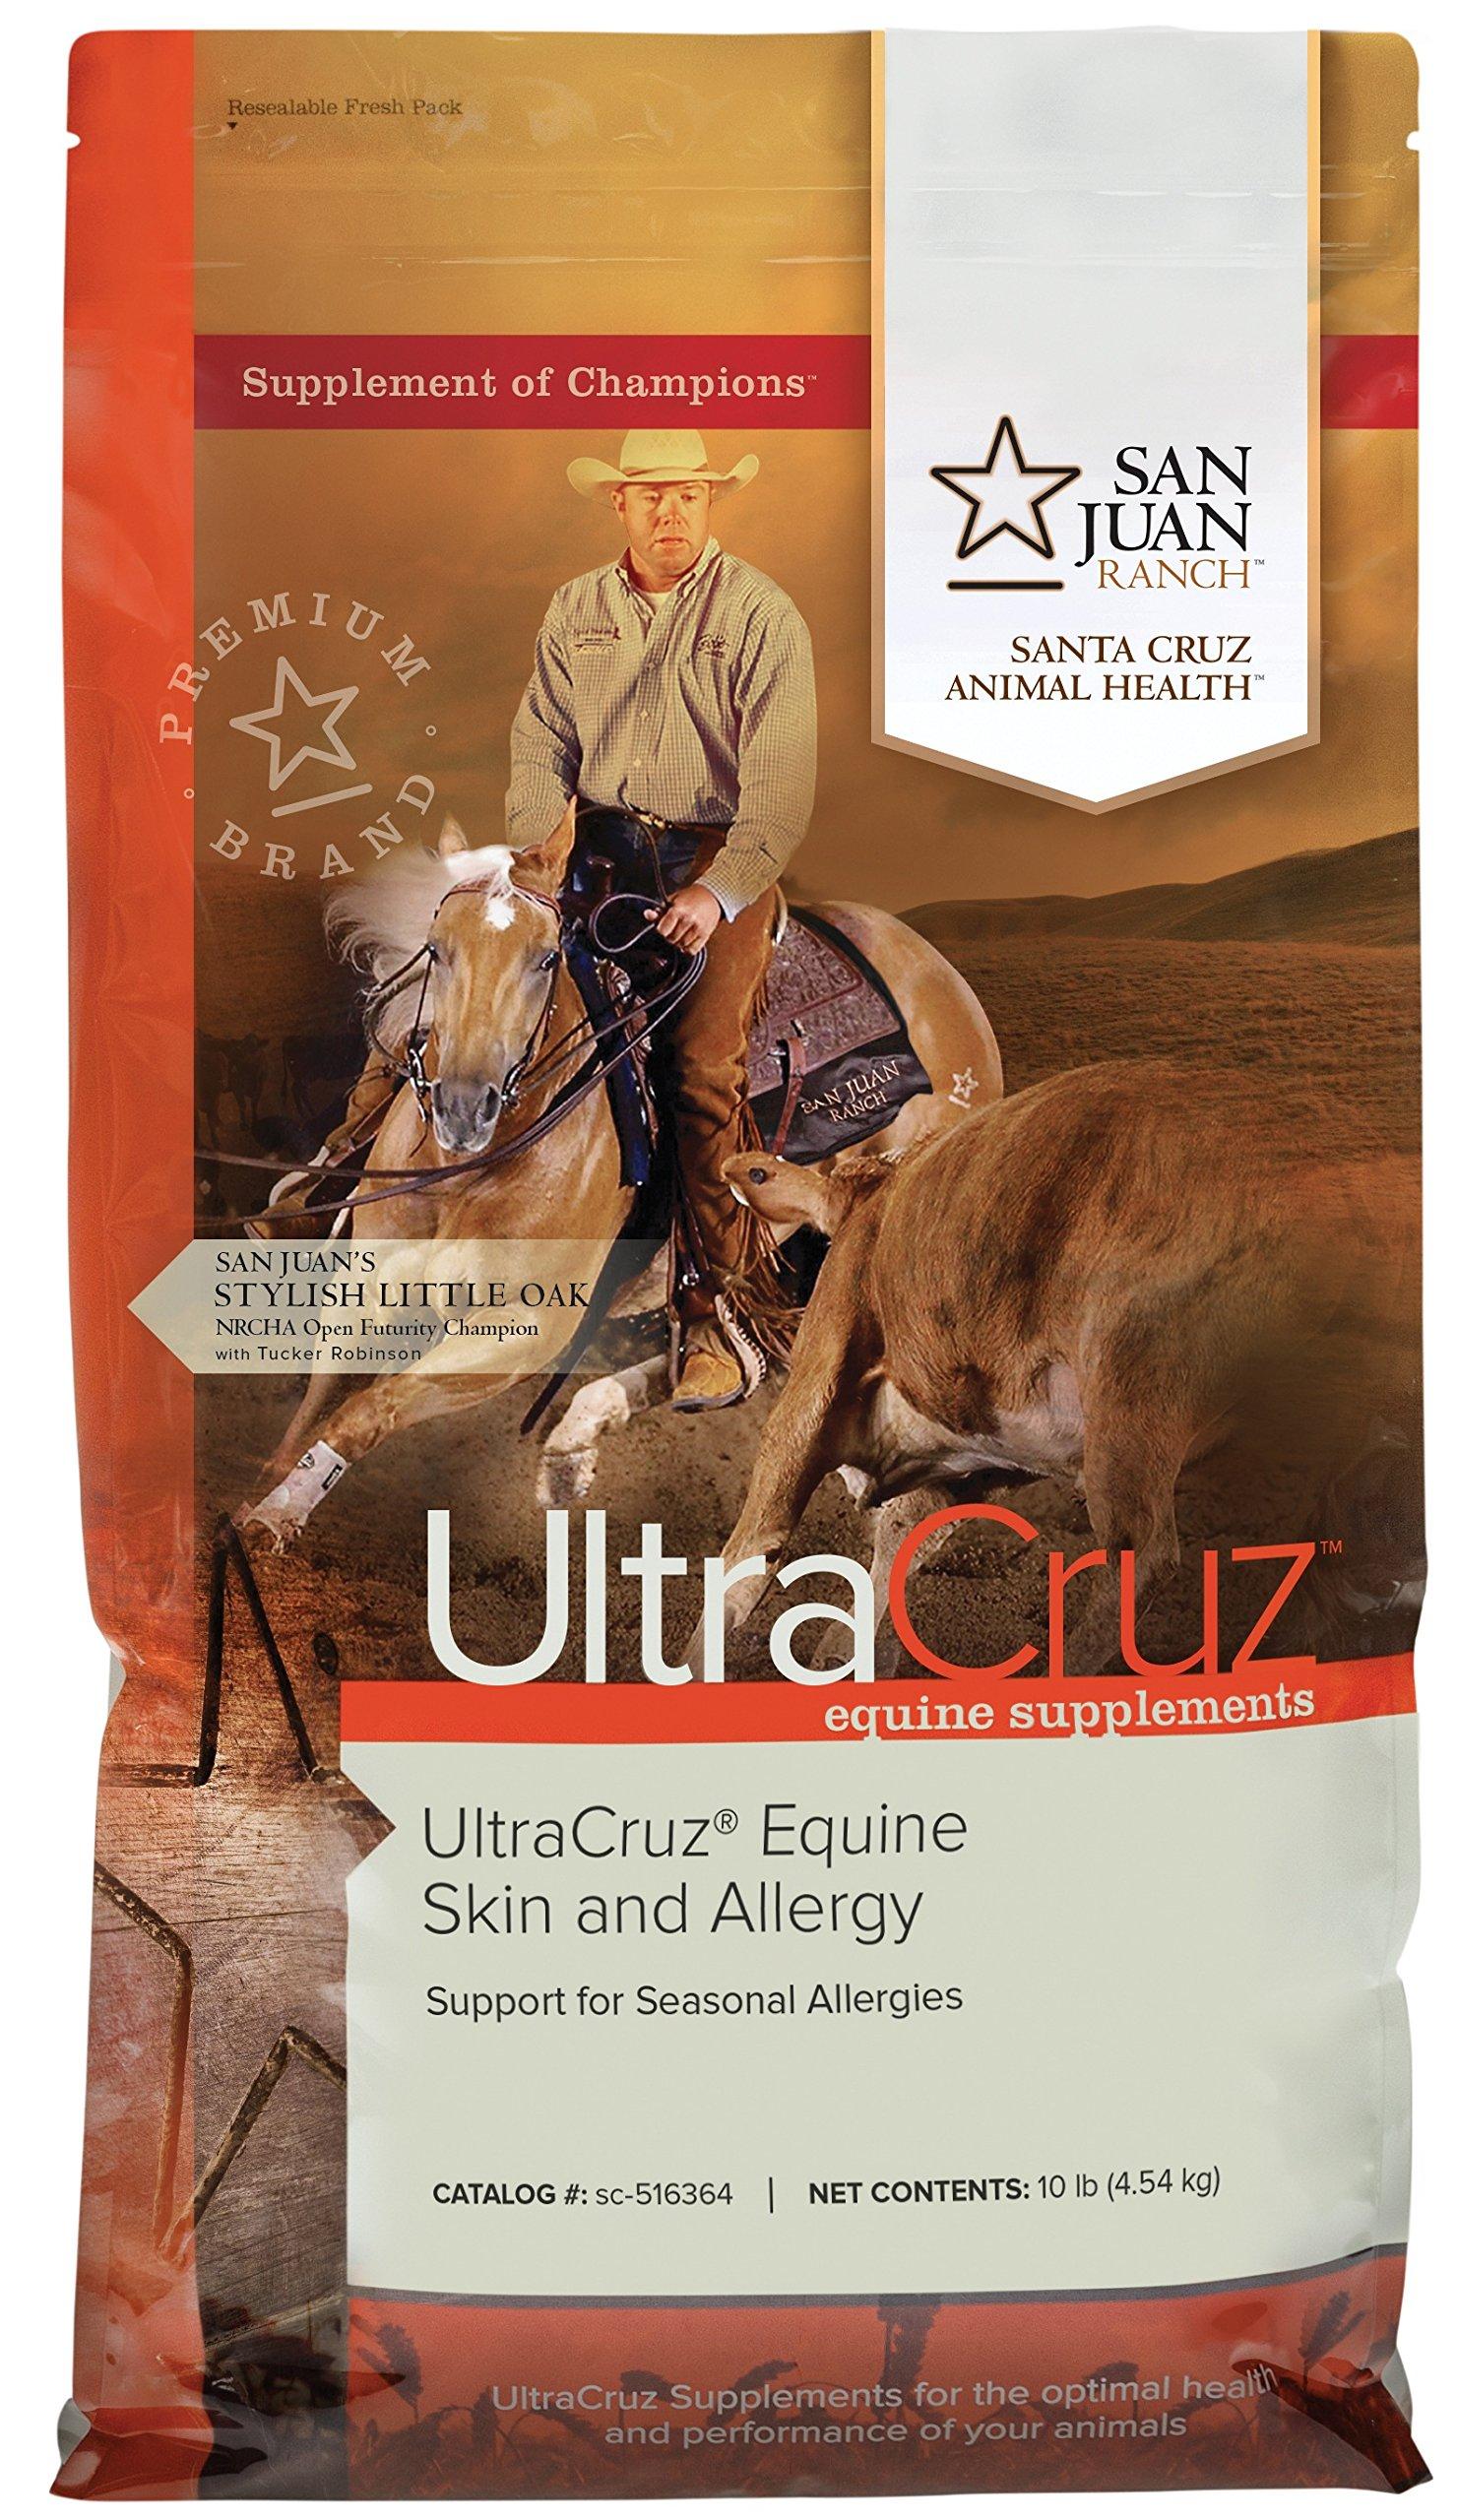 UltraCruz Equine Skin and Allergy Supplement for Horses, 10 lb, Pellet (80 Day Supply)